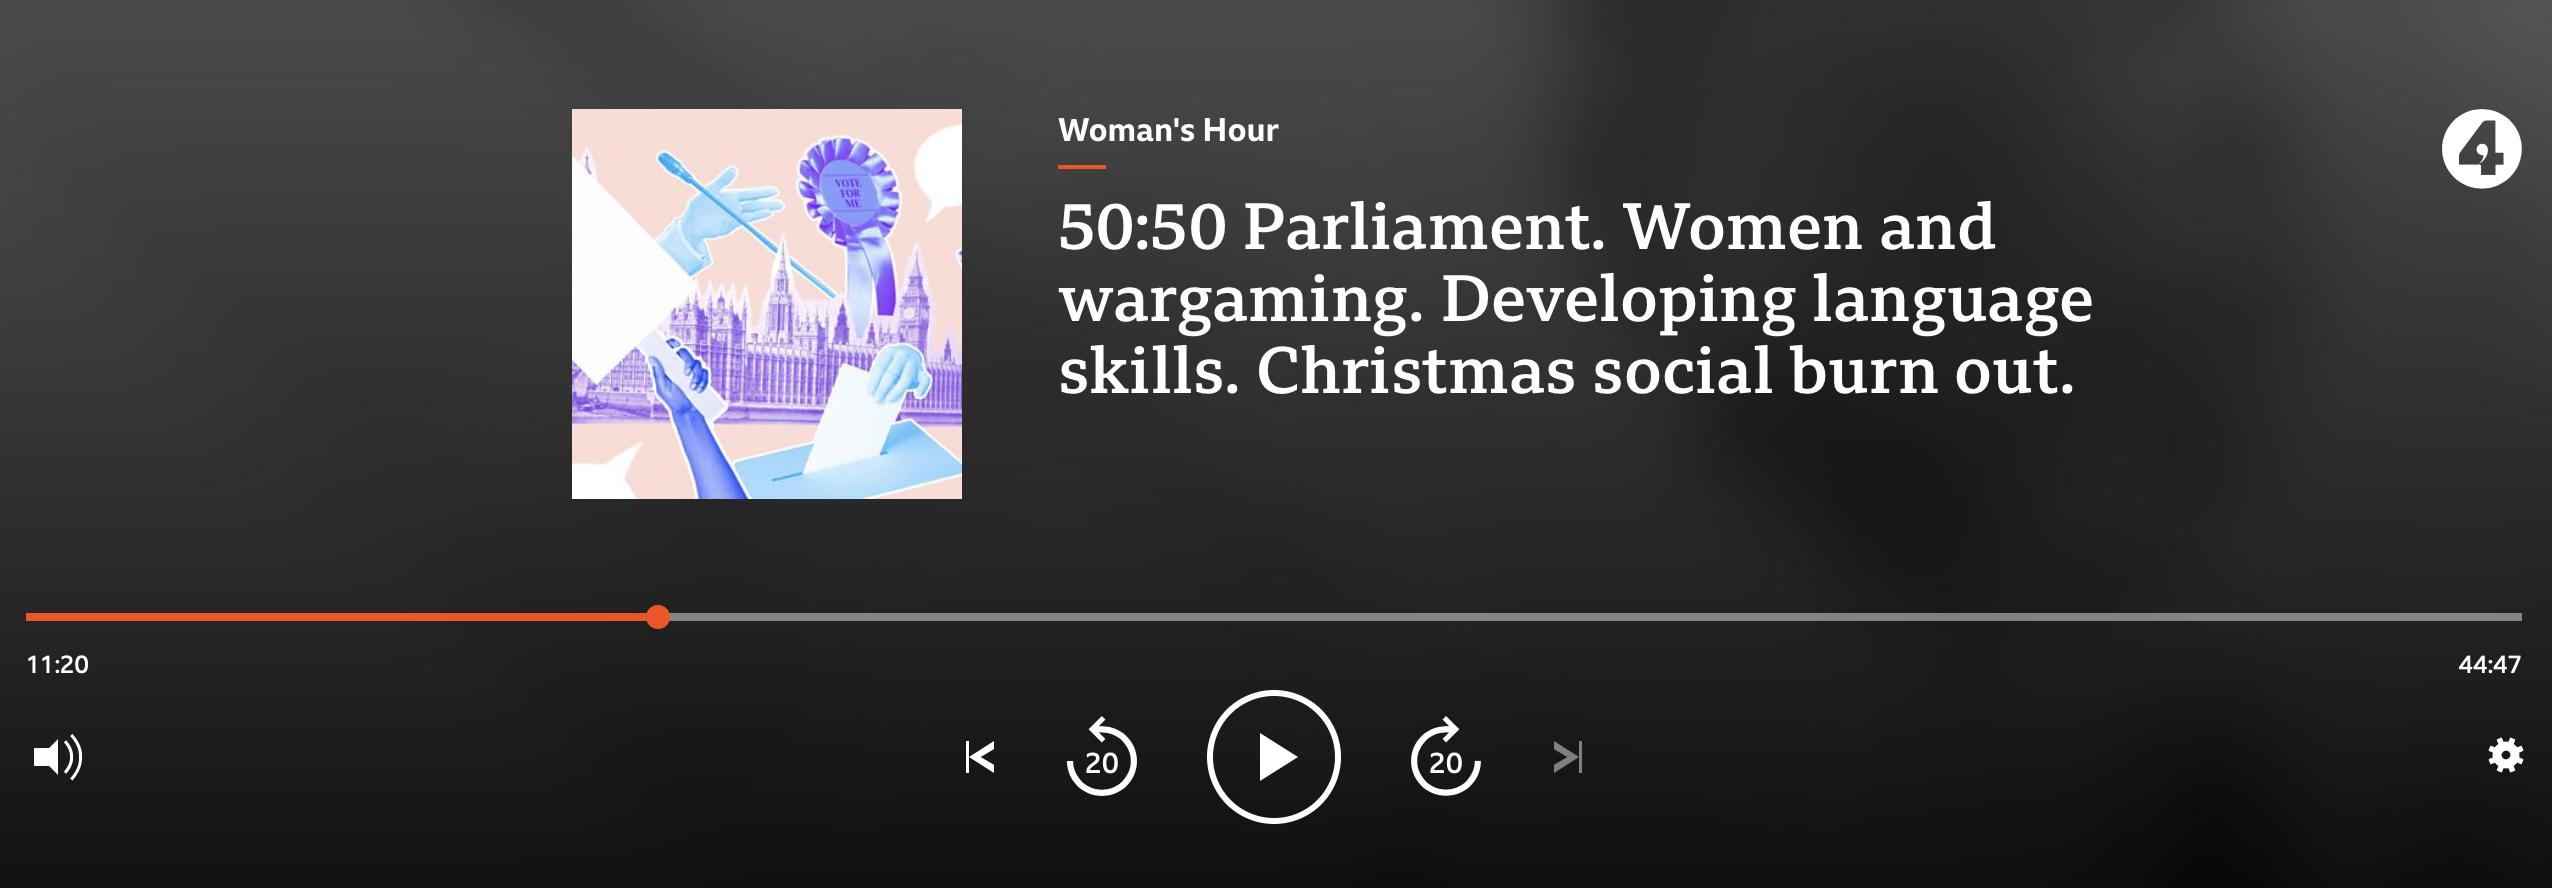 Woman's Hour sound player screenshot